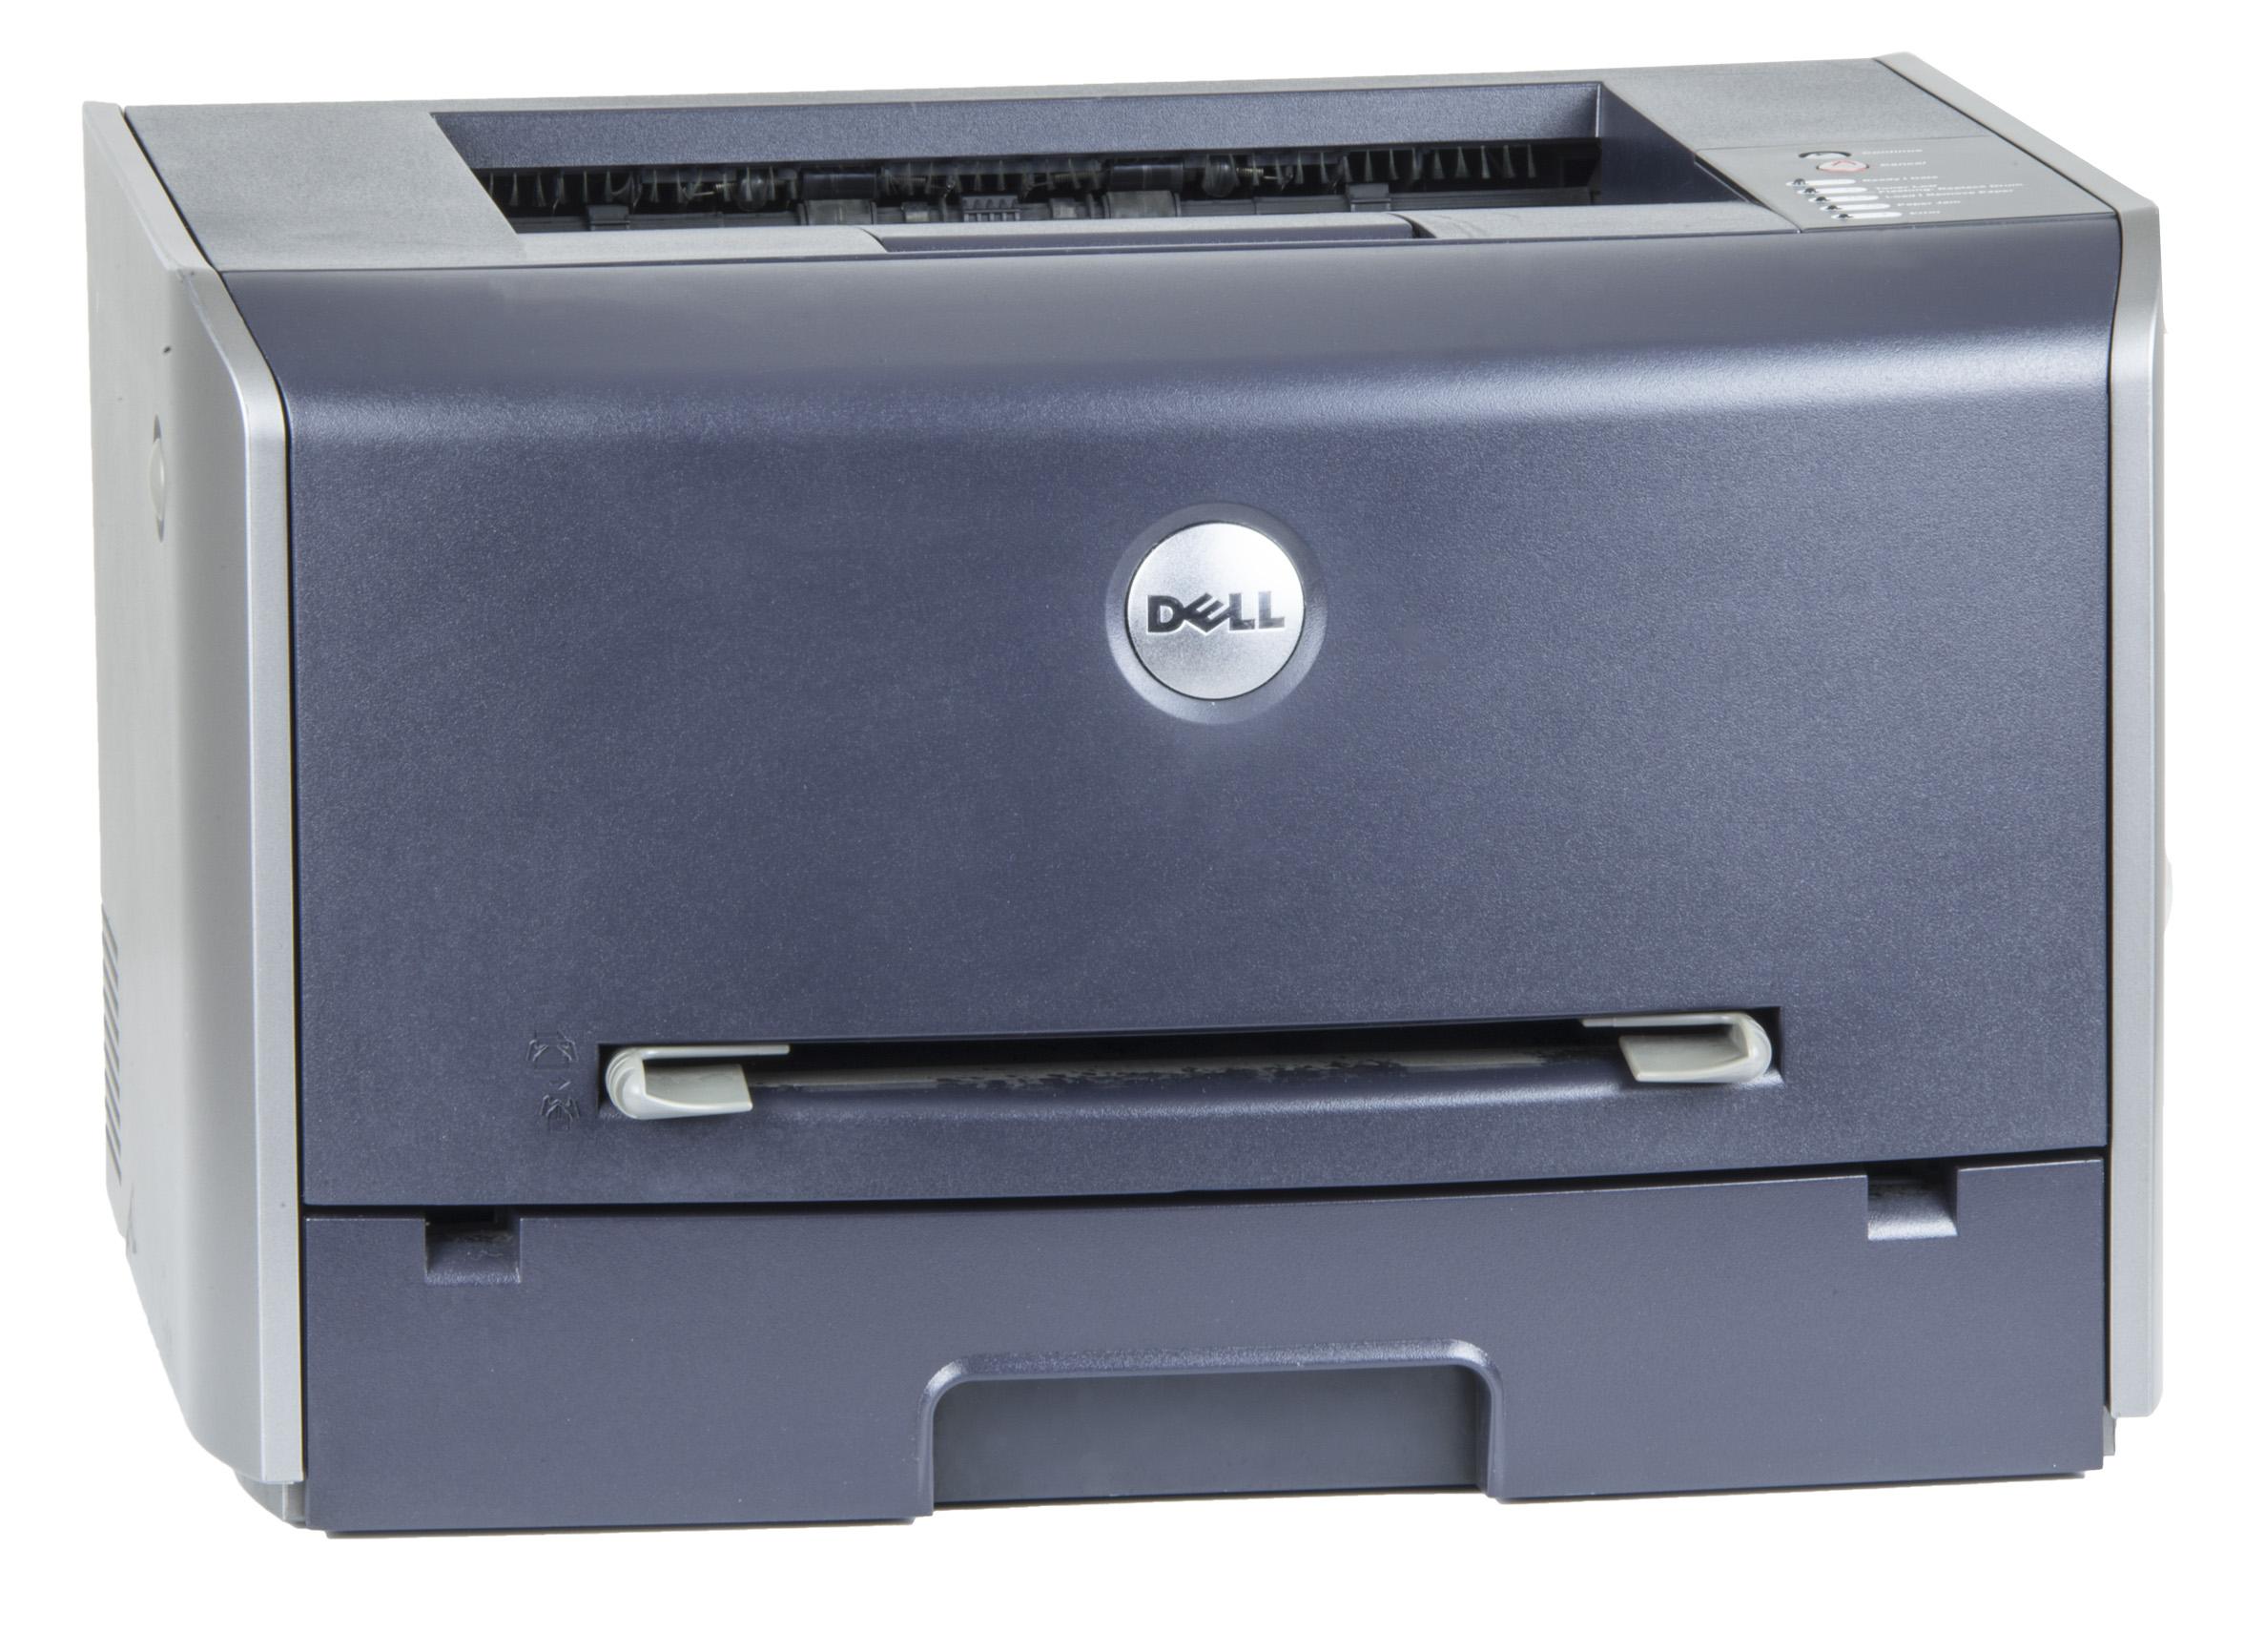 Dell  Laser Printer 1700 N